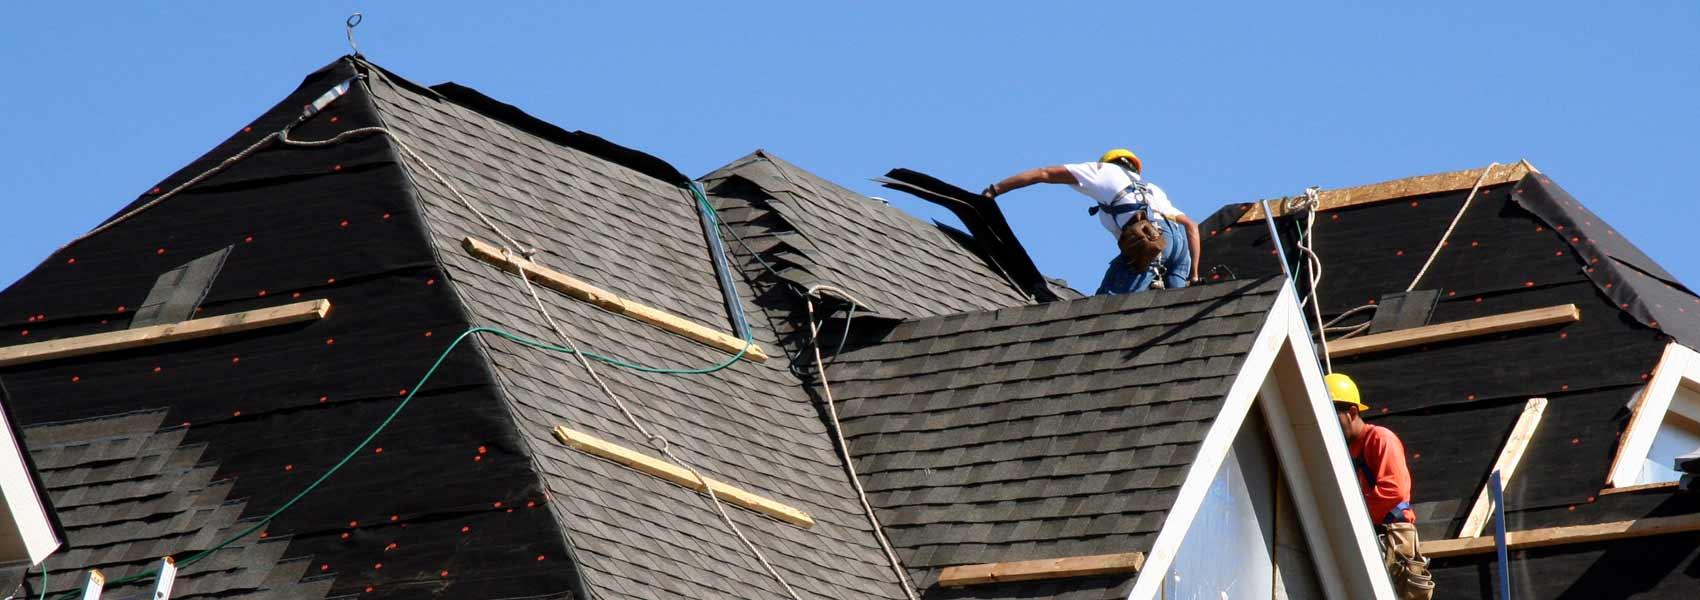 Dachformen Preisvergleich 11880 Dachdecker Com